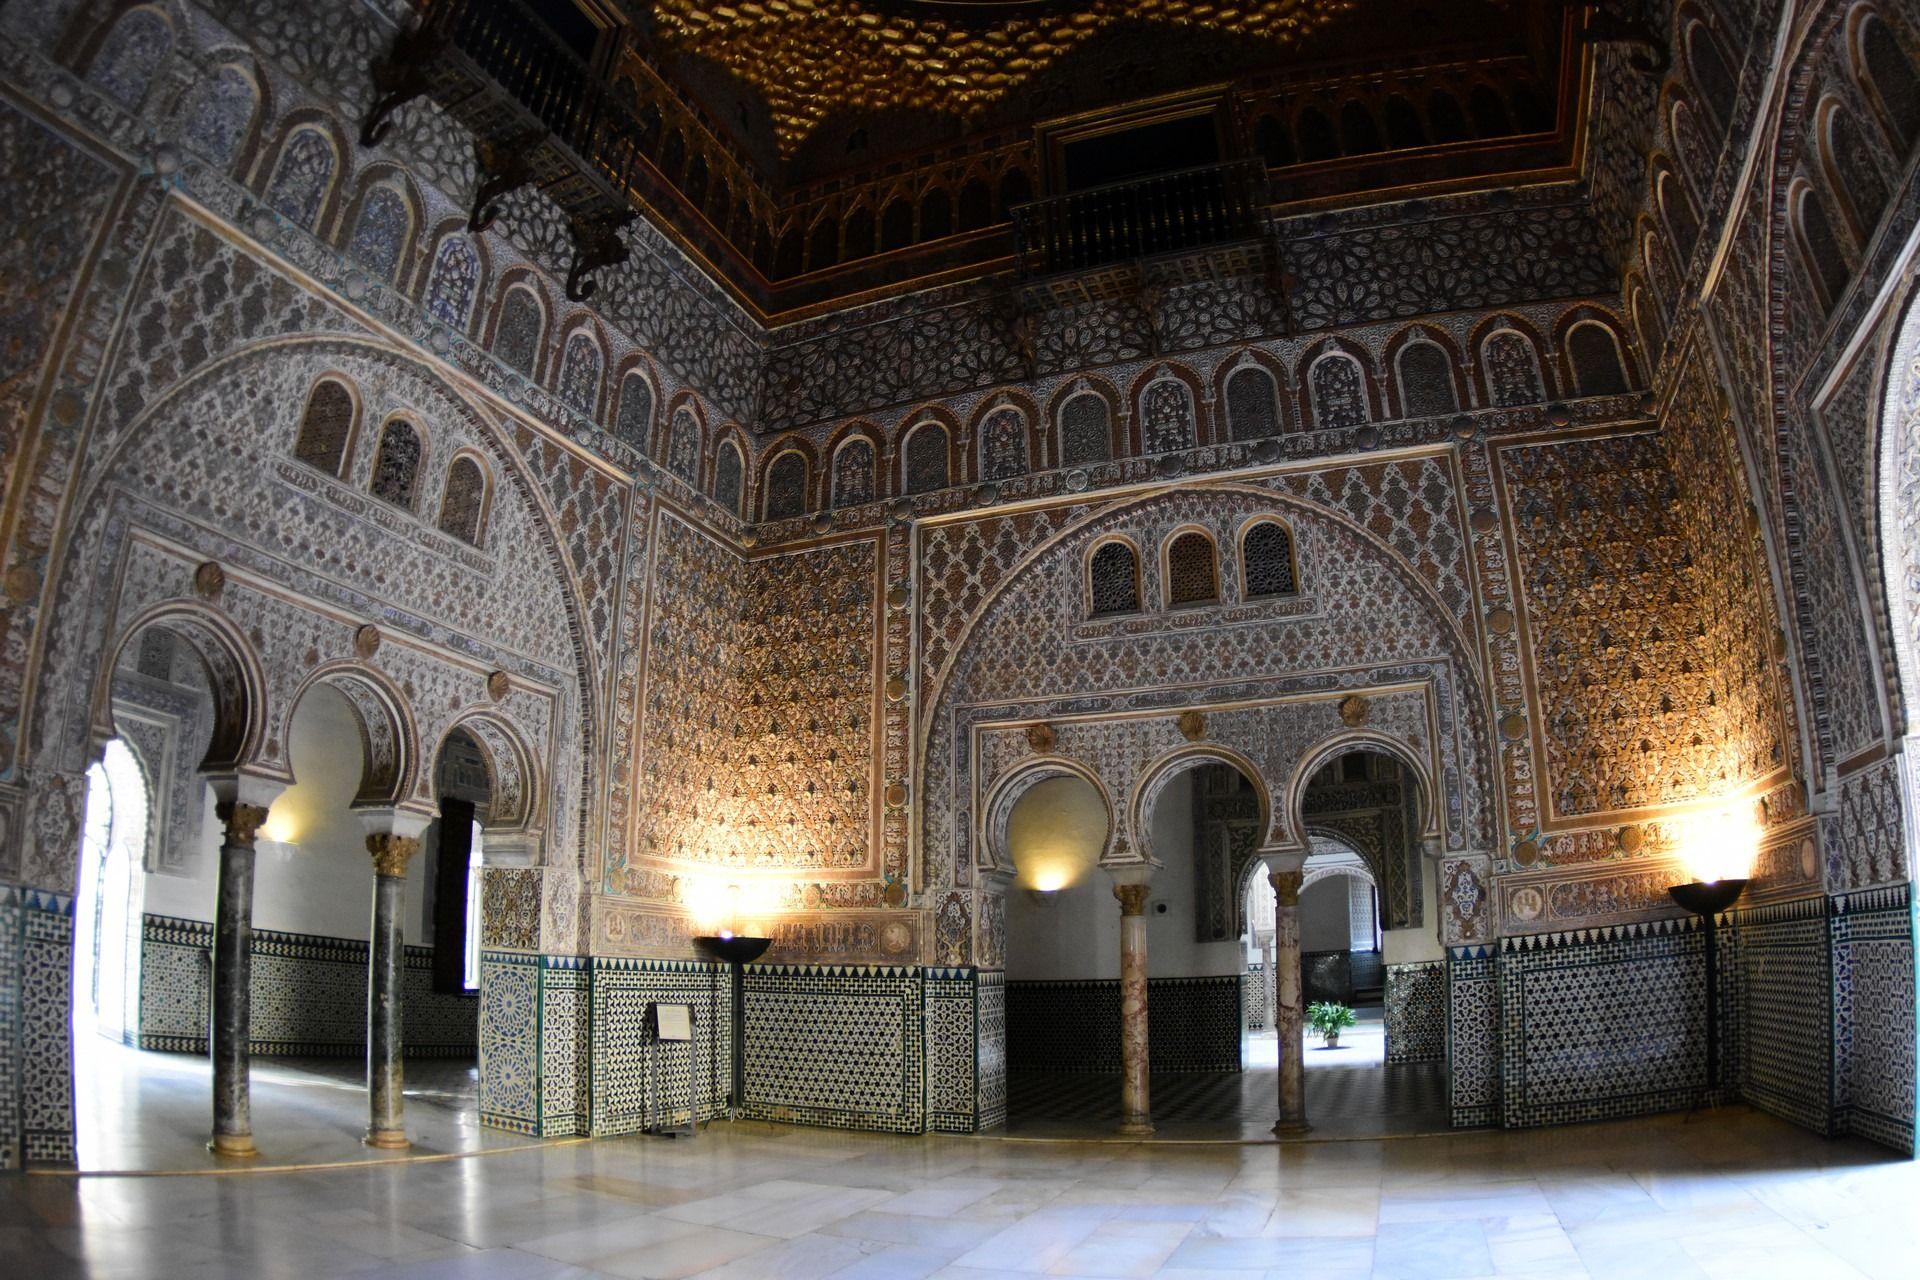 Spain – Seville: Cathedral & Royal Alcazar